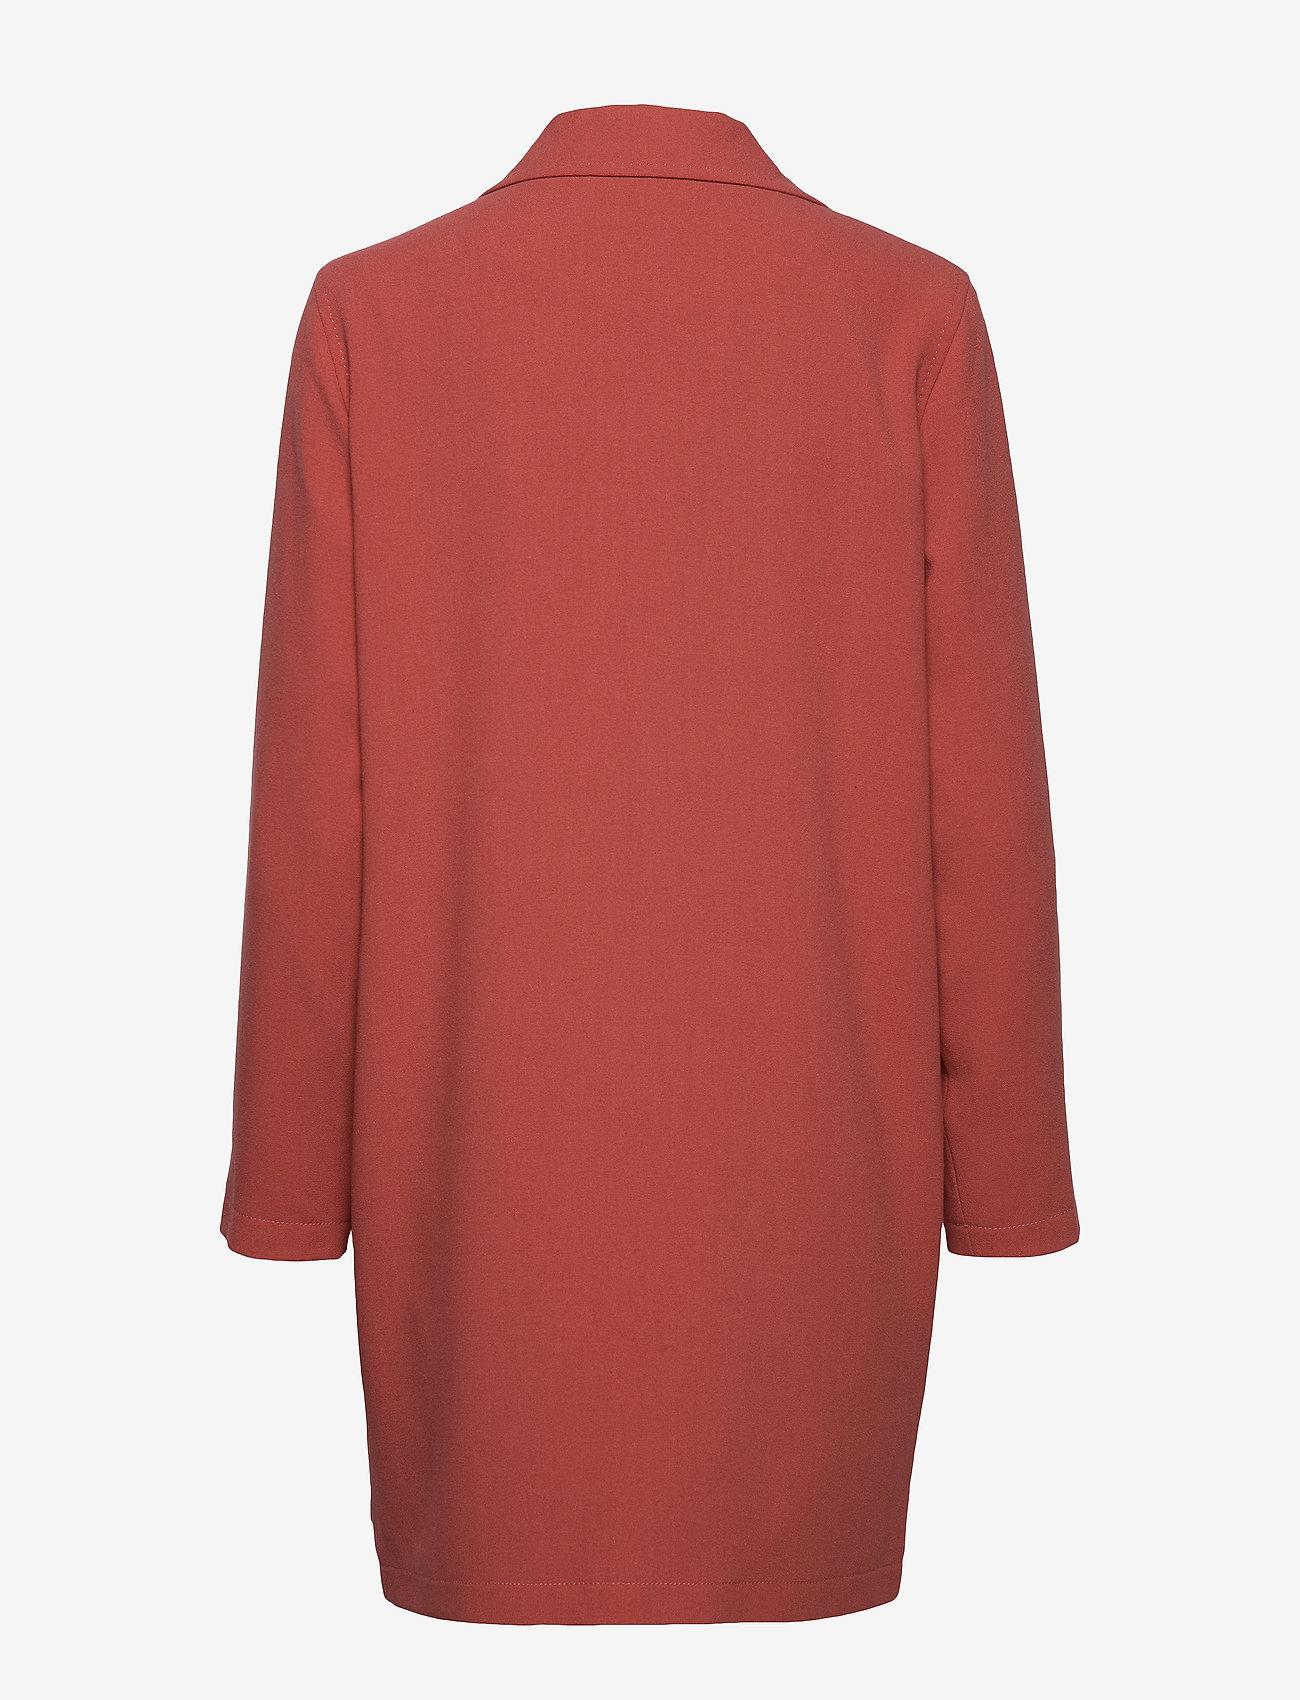 Long Jacket W. Basting Stitch Detai (Canyon Rose) (539.70 kr) - Coster Copenhagen